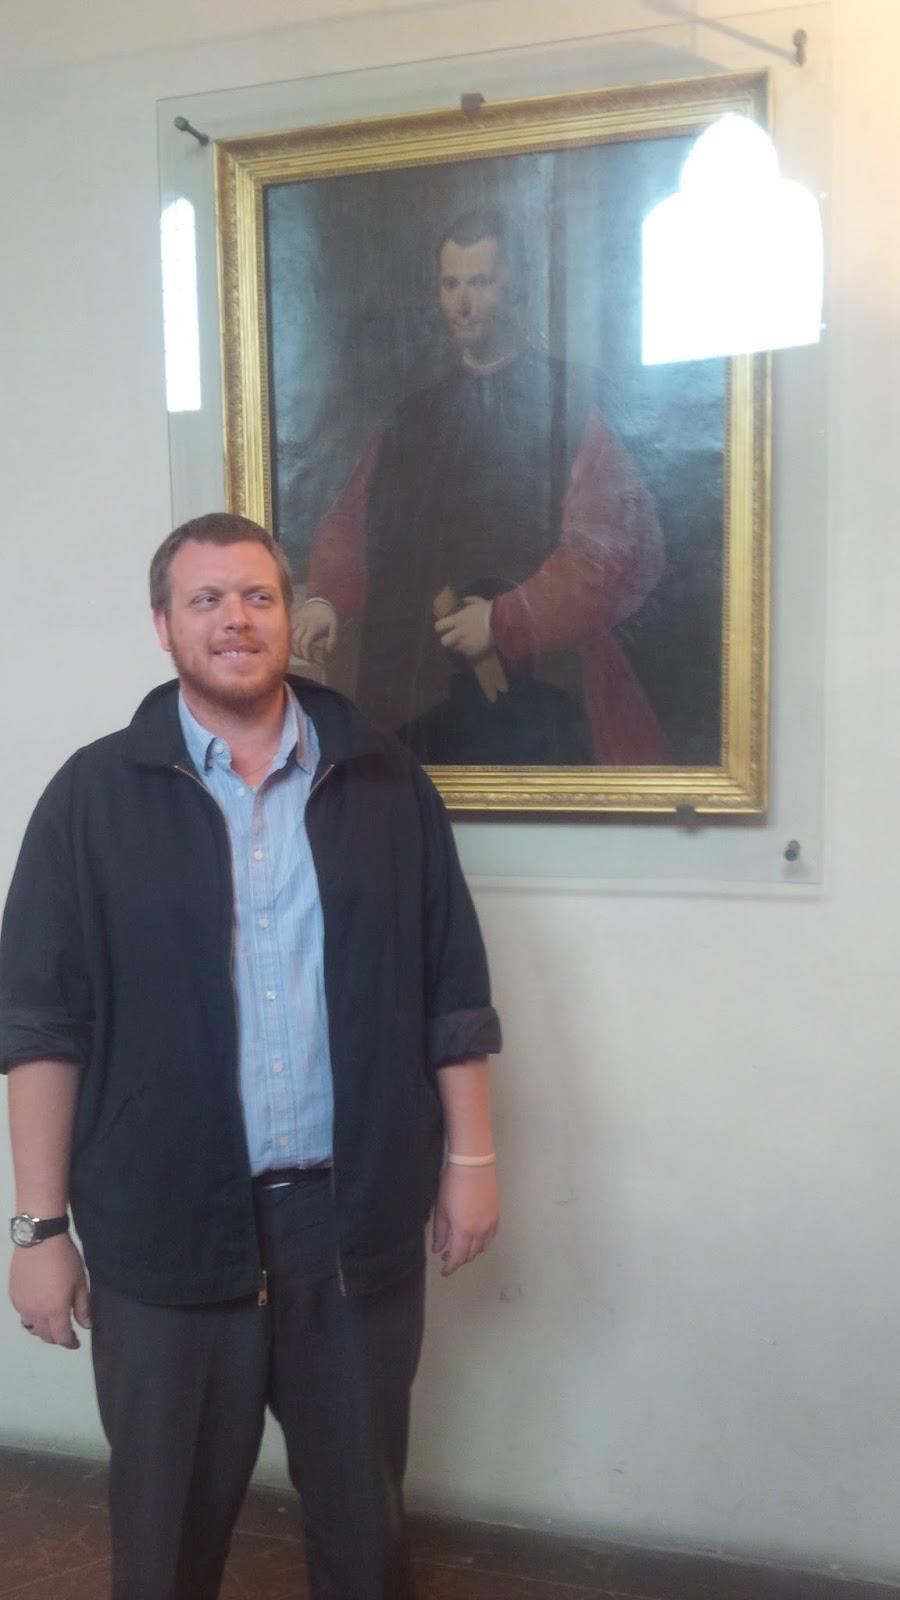 dissertation machiavelli me the portrait of machiavelli in the palazzo vecchio in florence